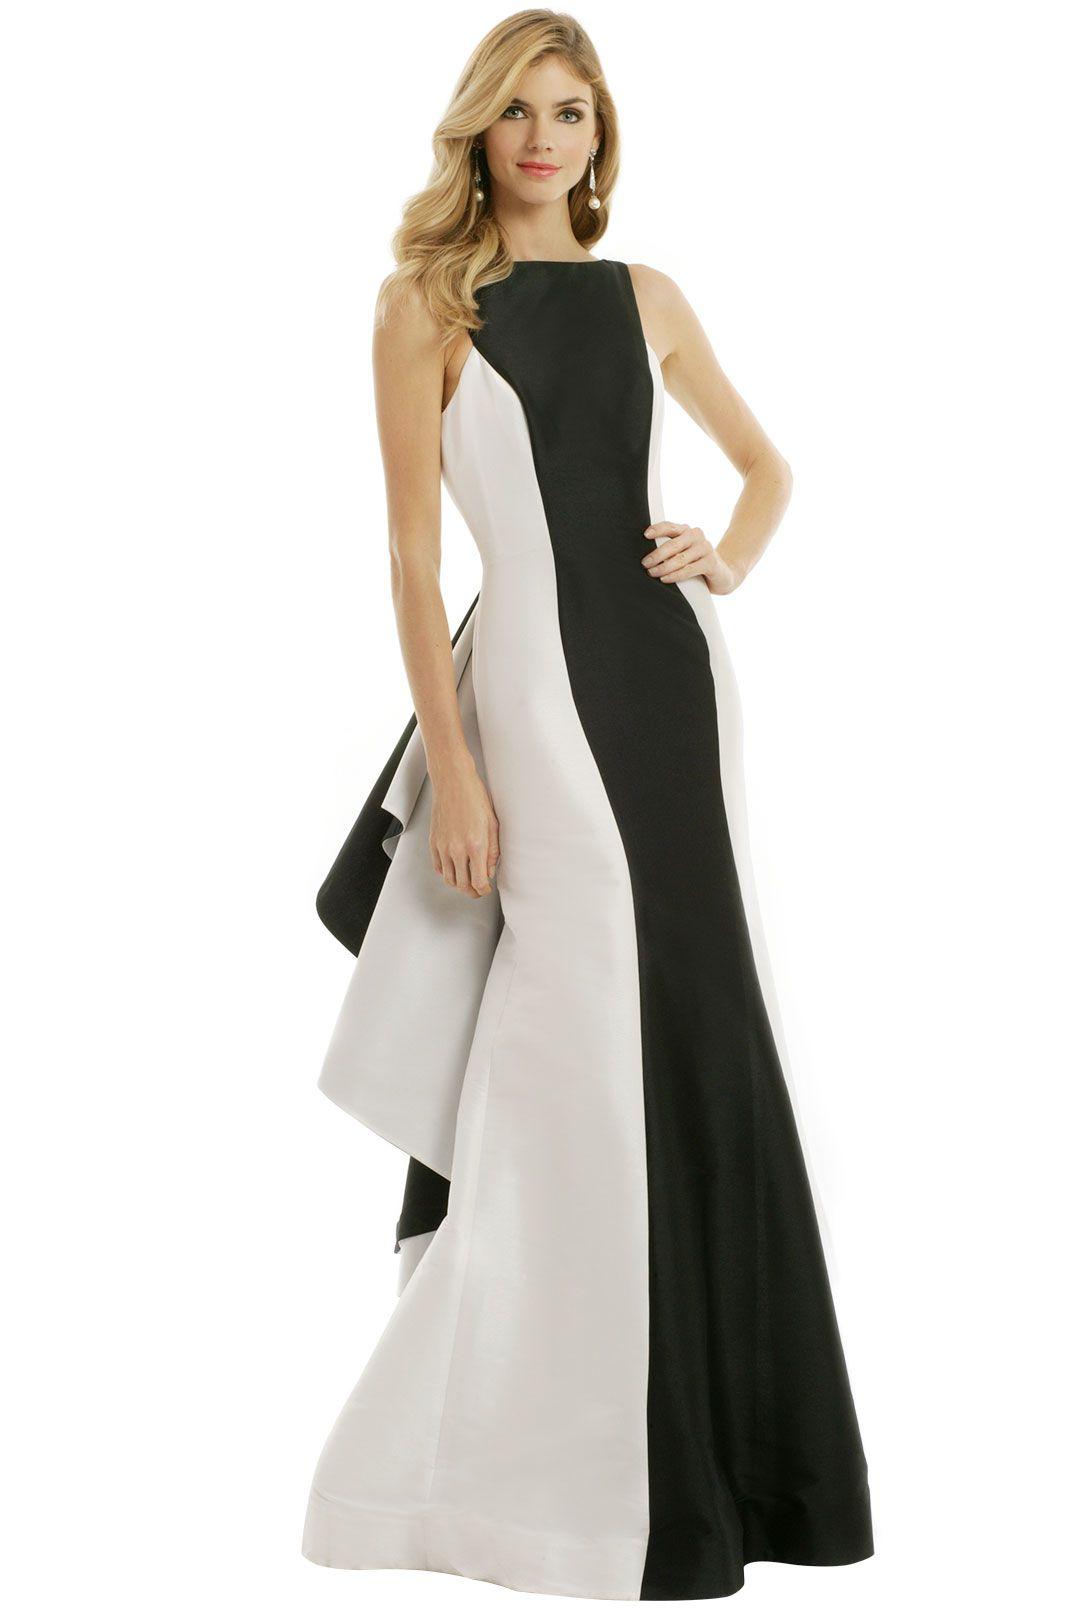 Prom dresses o fallon monique best dress ideas pinterest